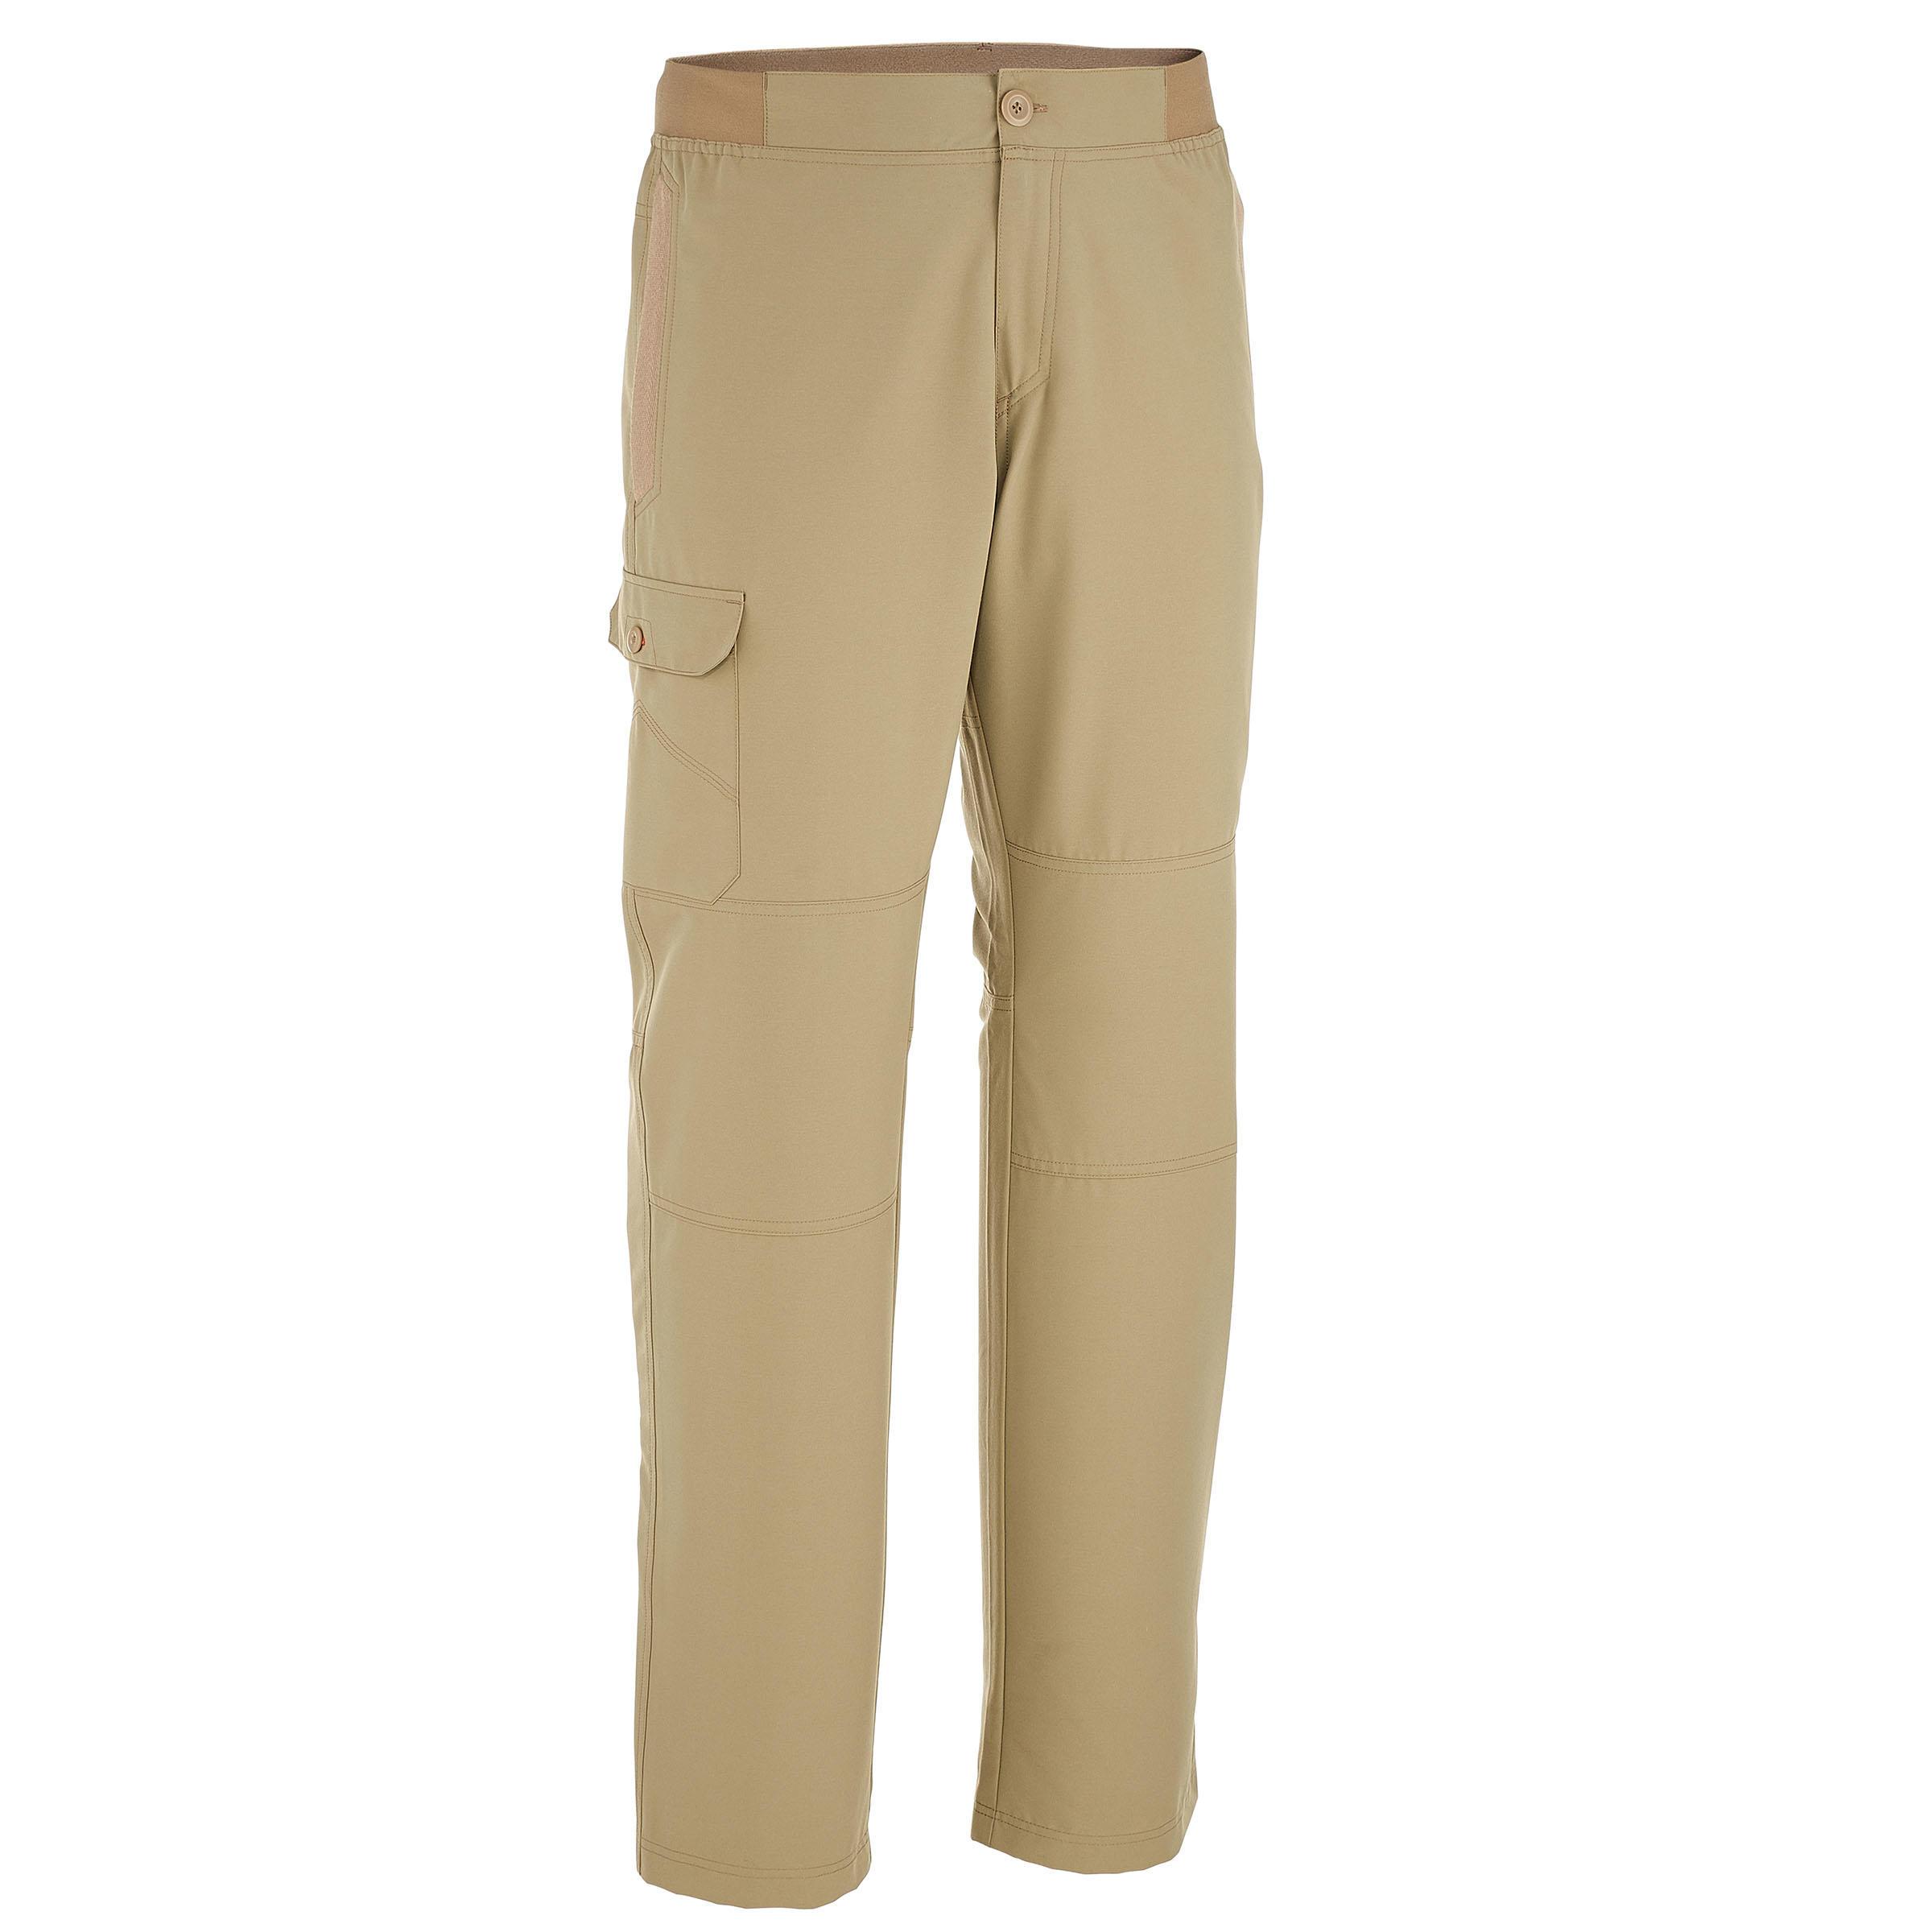 Men's NH100 Country Walking Trousers - Beige